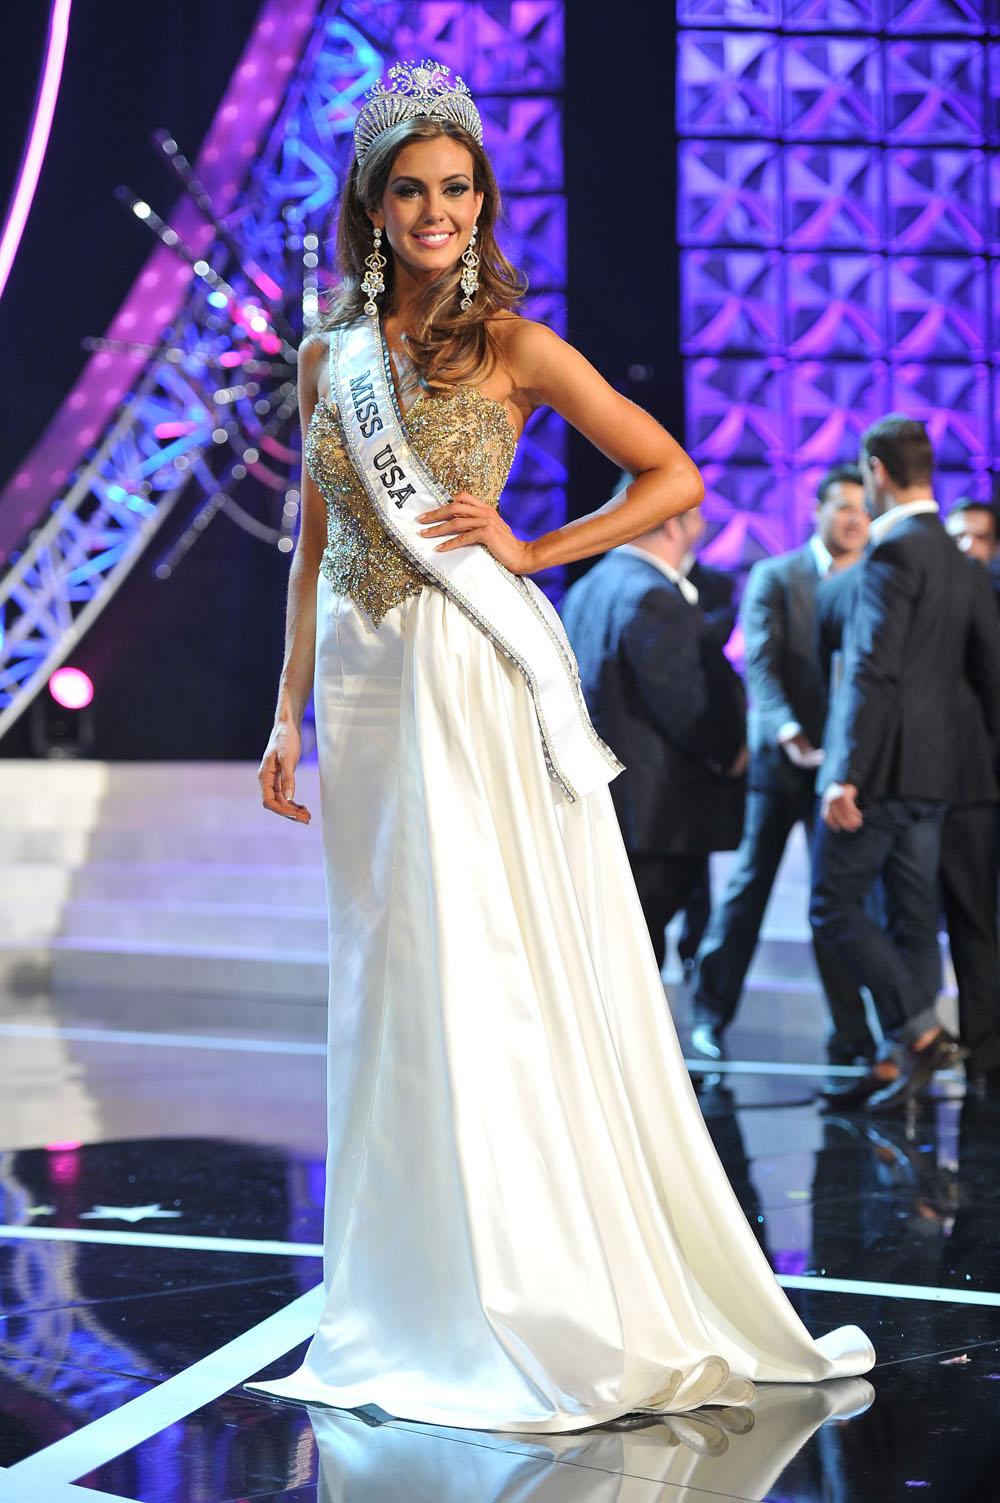 Miss USA Erin Brady on Pageant Fashion: It's Definitely Modernizing' pics